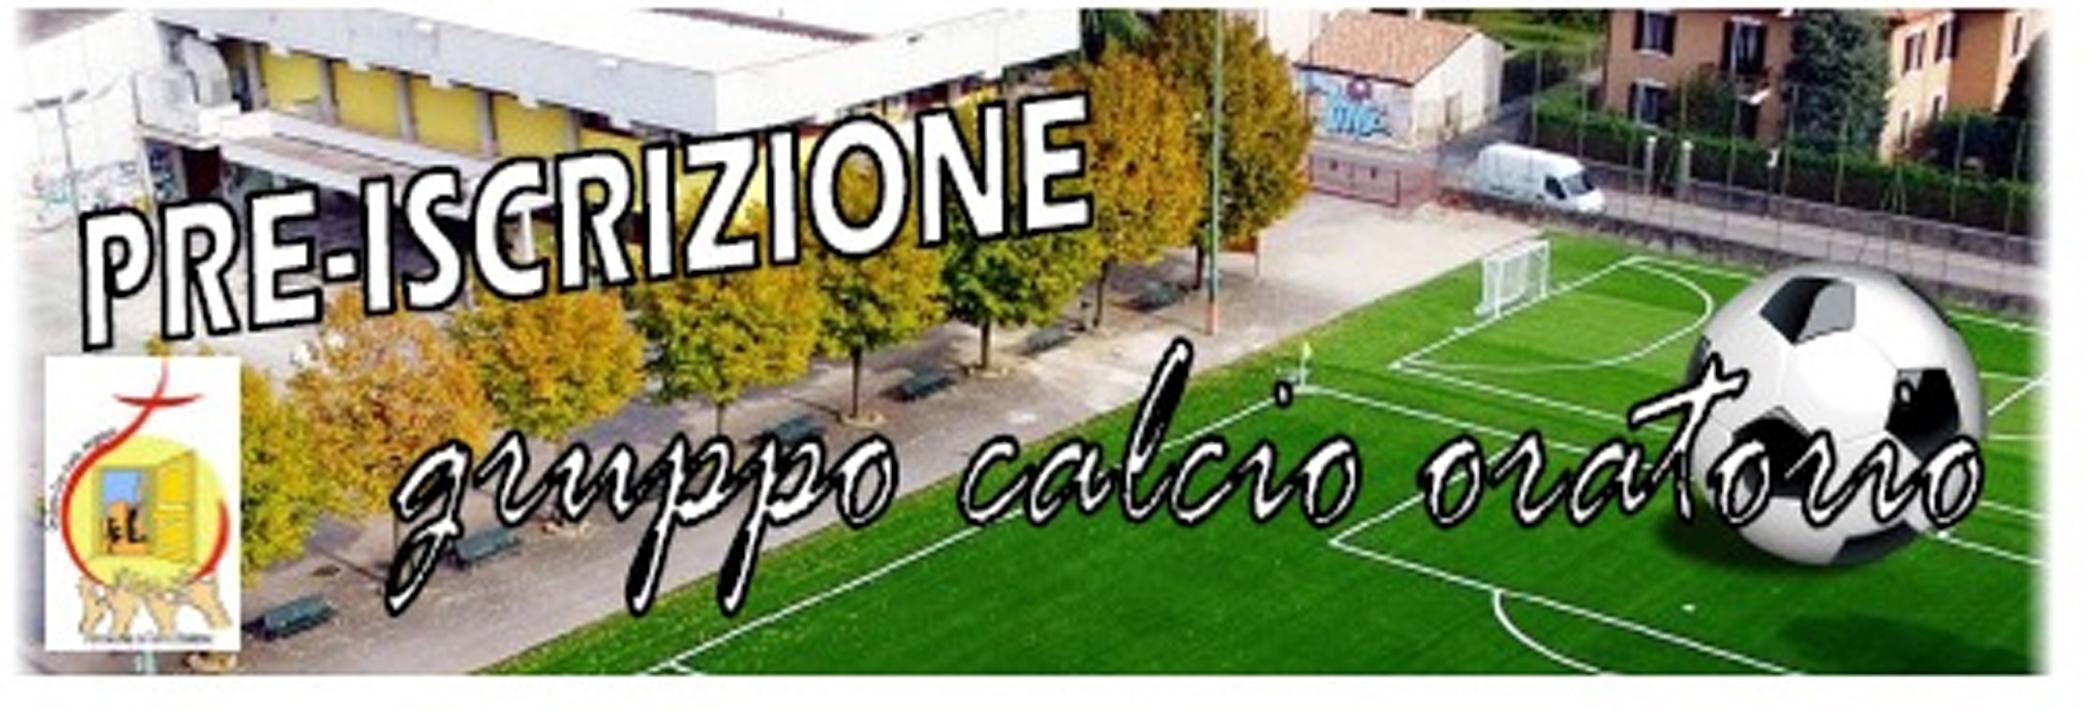 oratorio-calcio-logo1